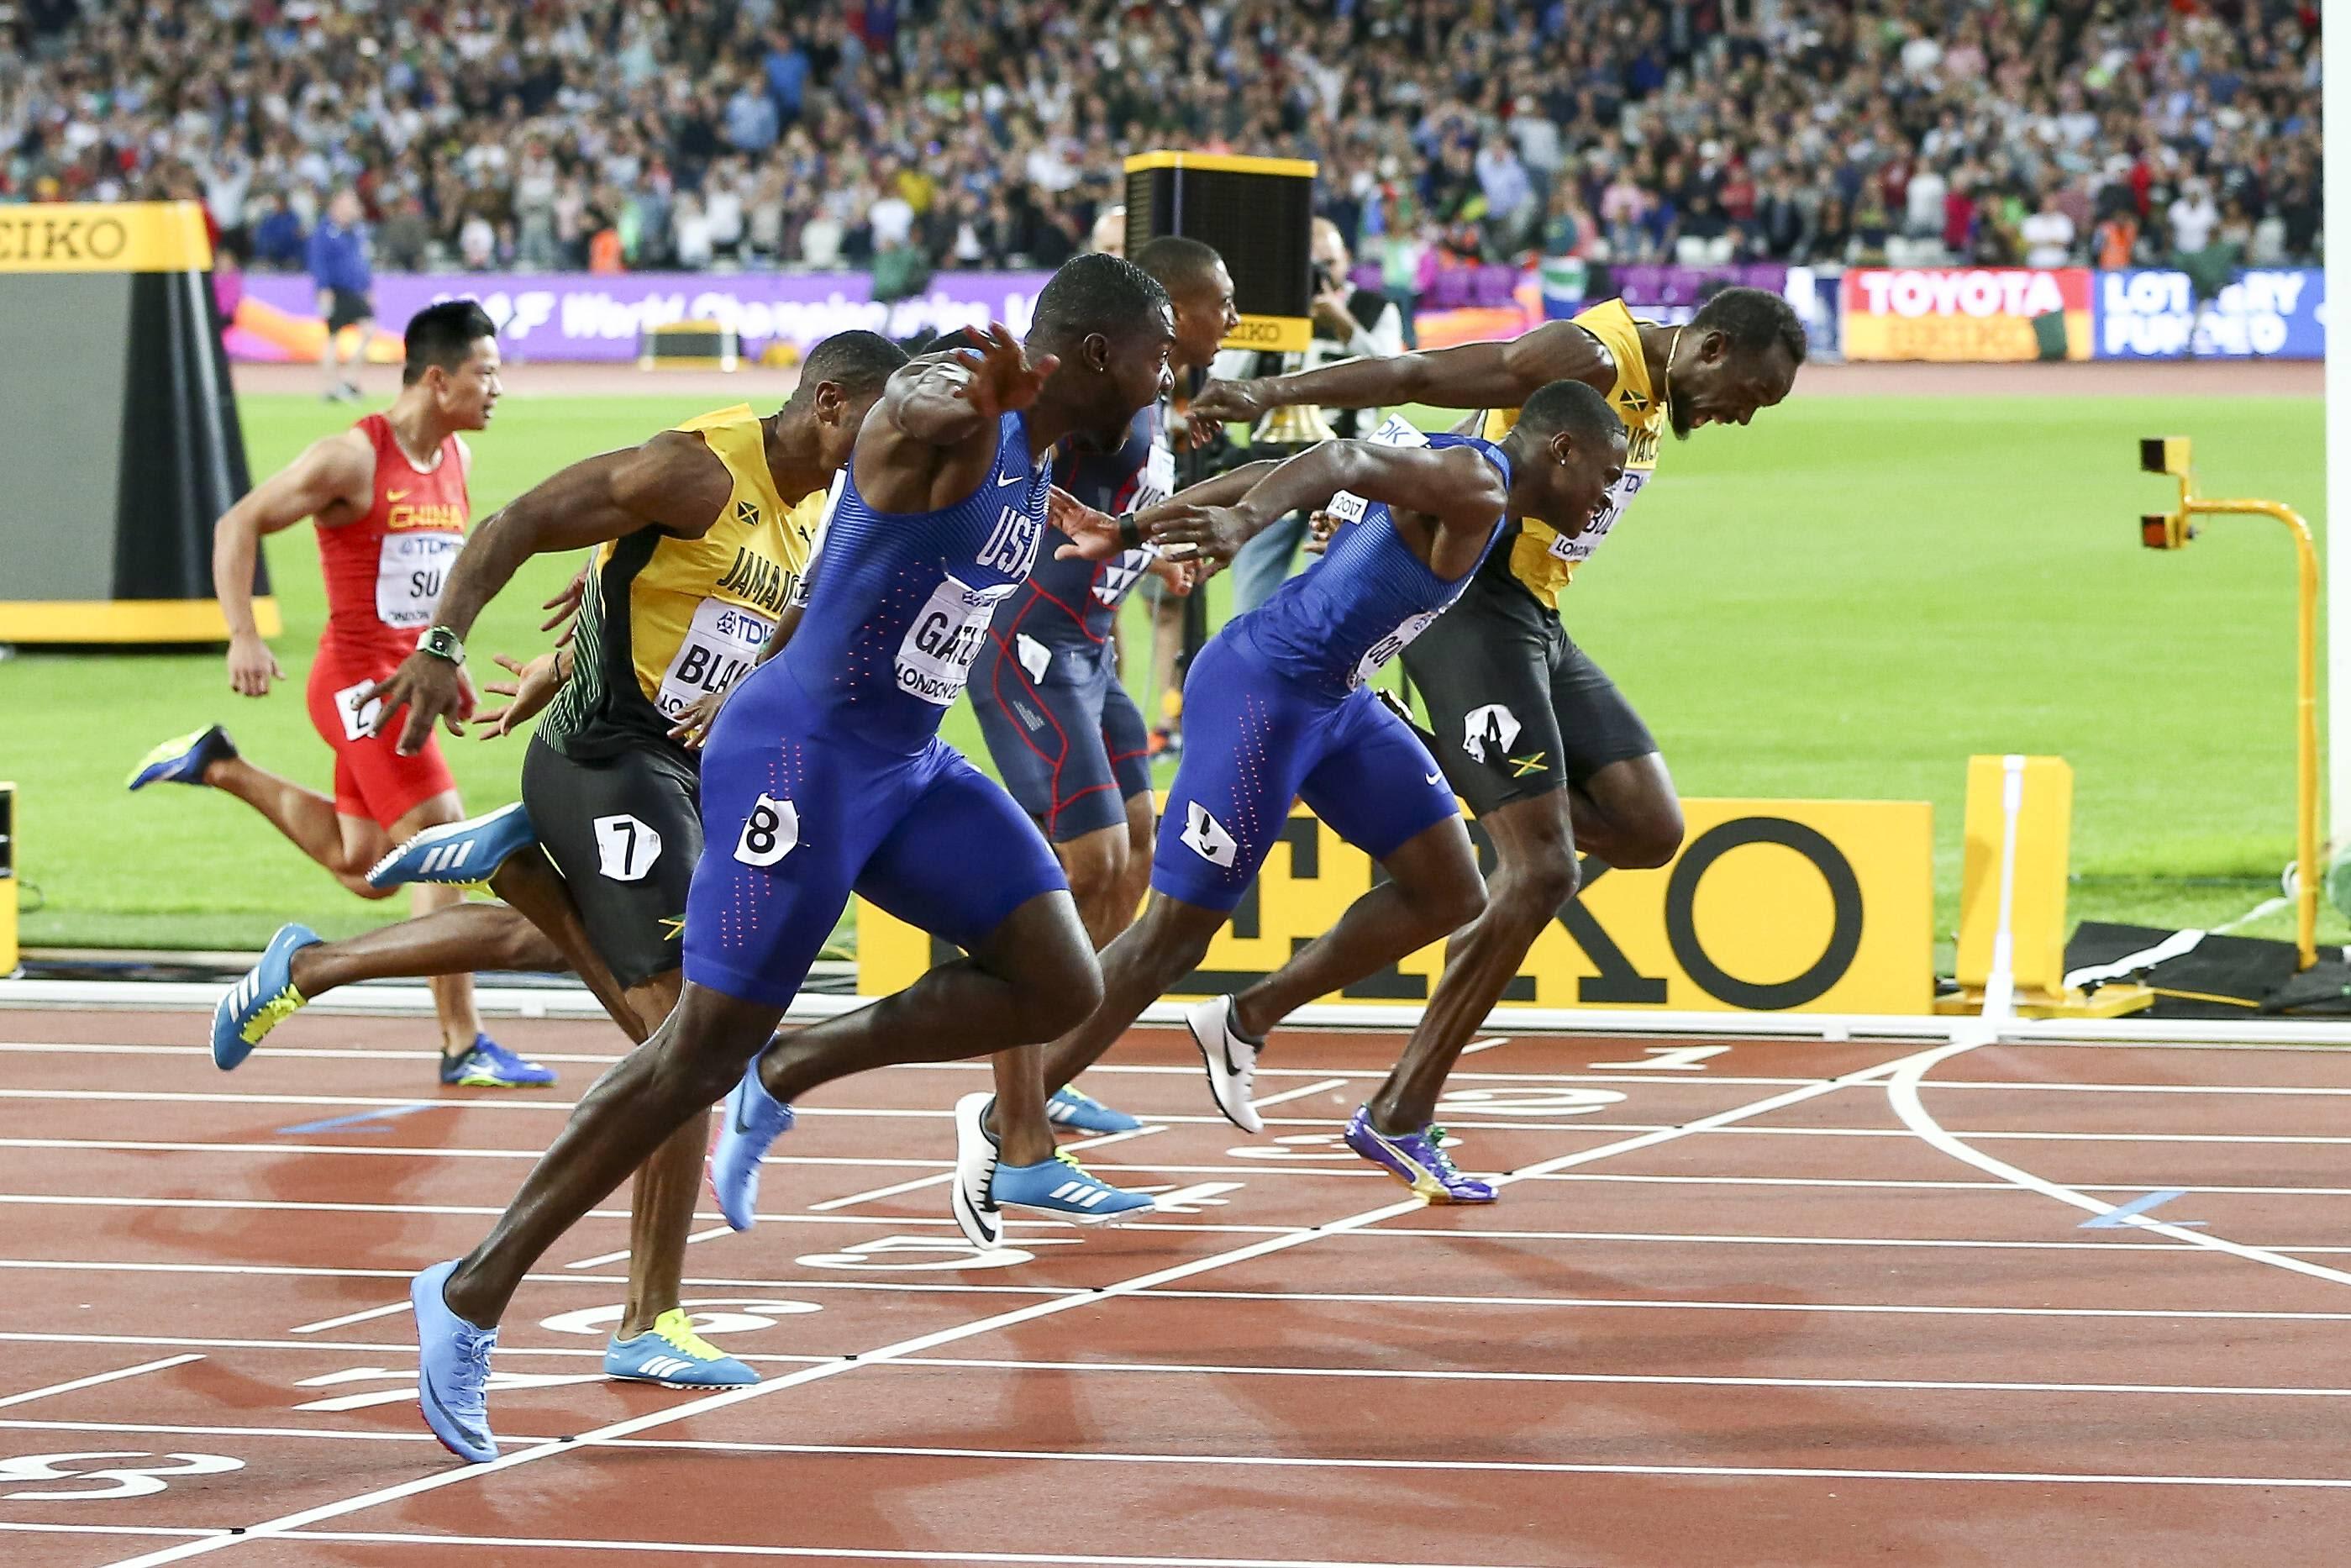 MAaliintulo Justin Gatlin Christian Coleman Usain Bolt